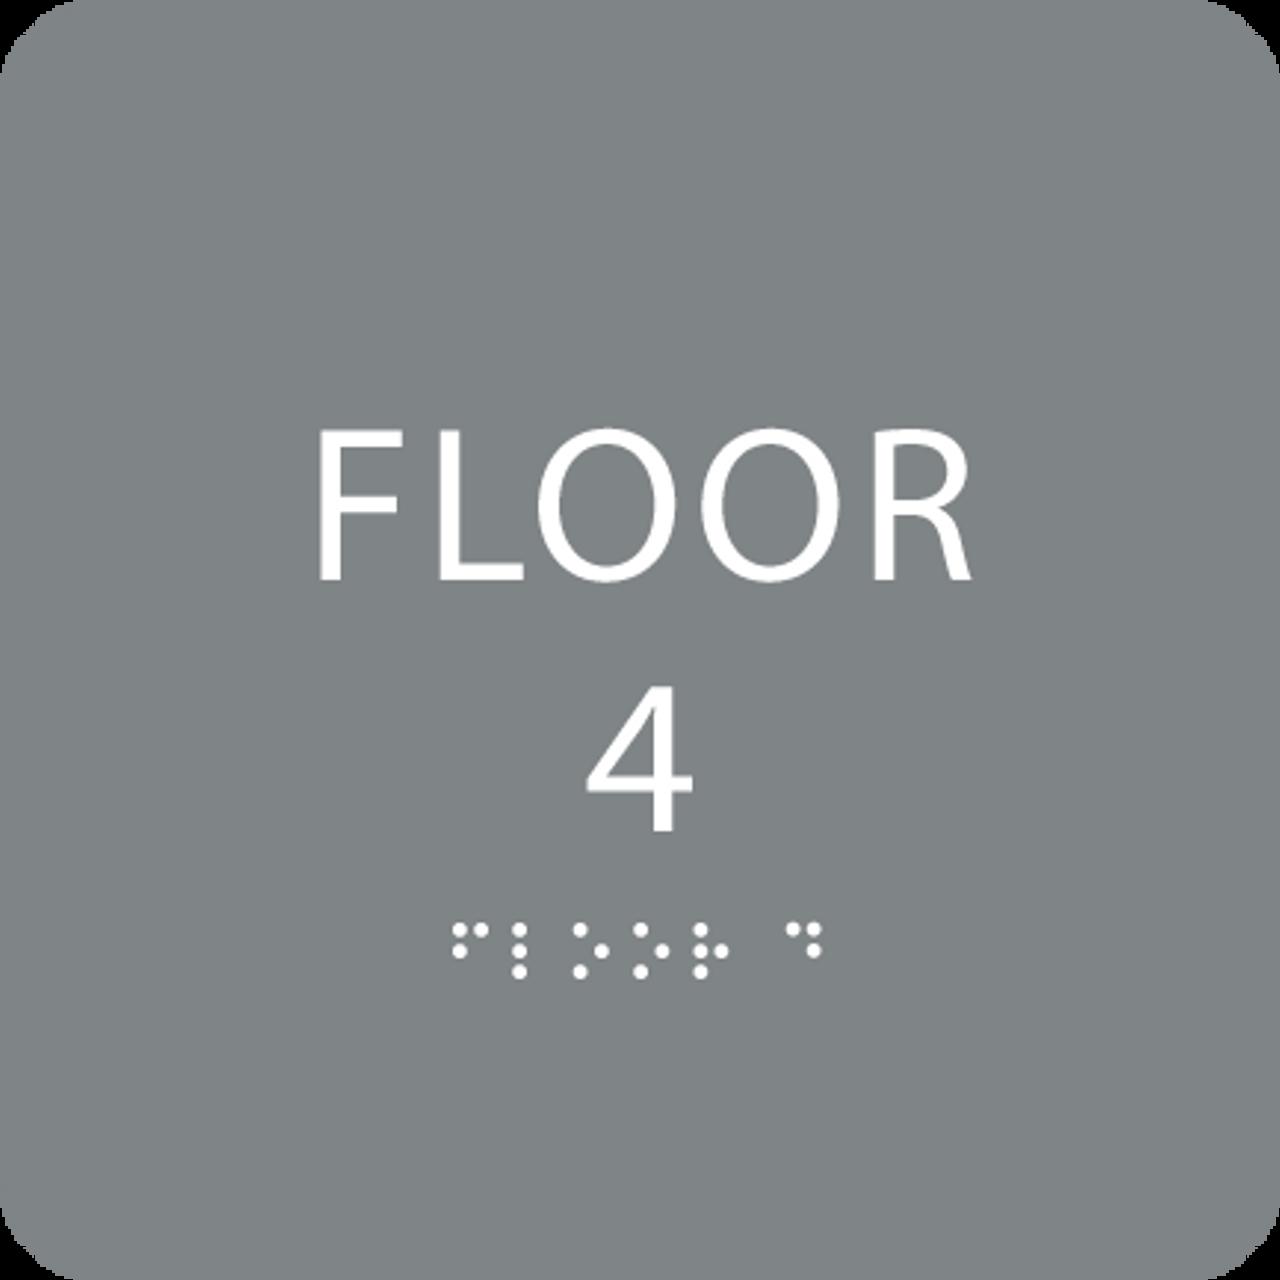 Grey Floor 4 Identification Sign